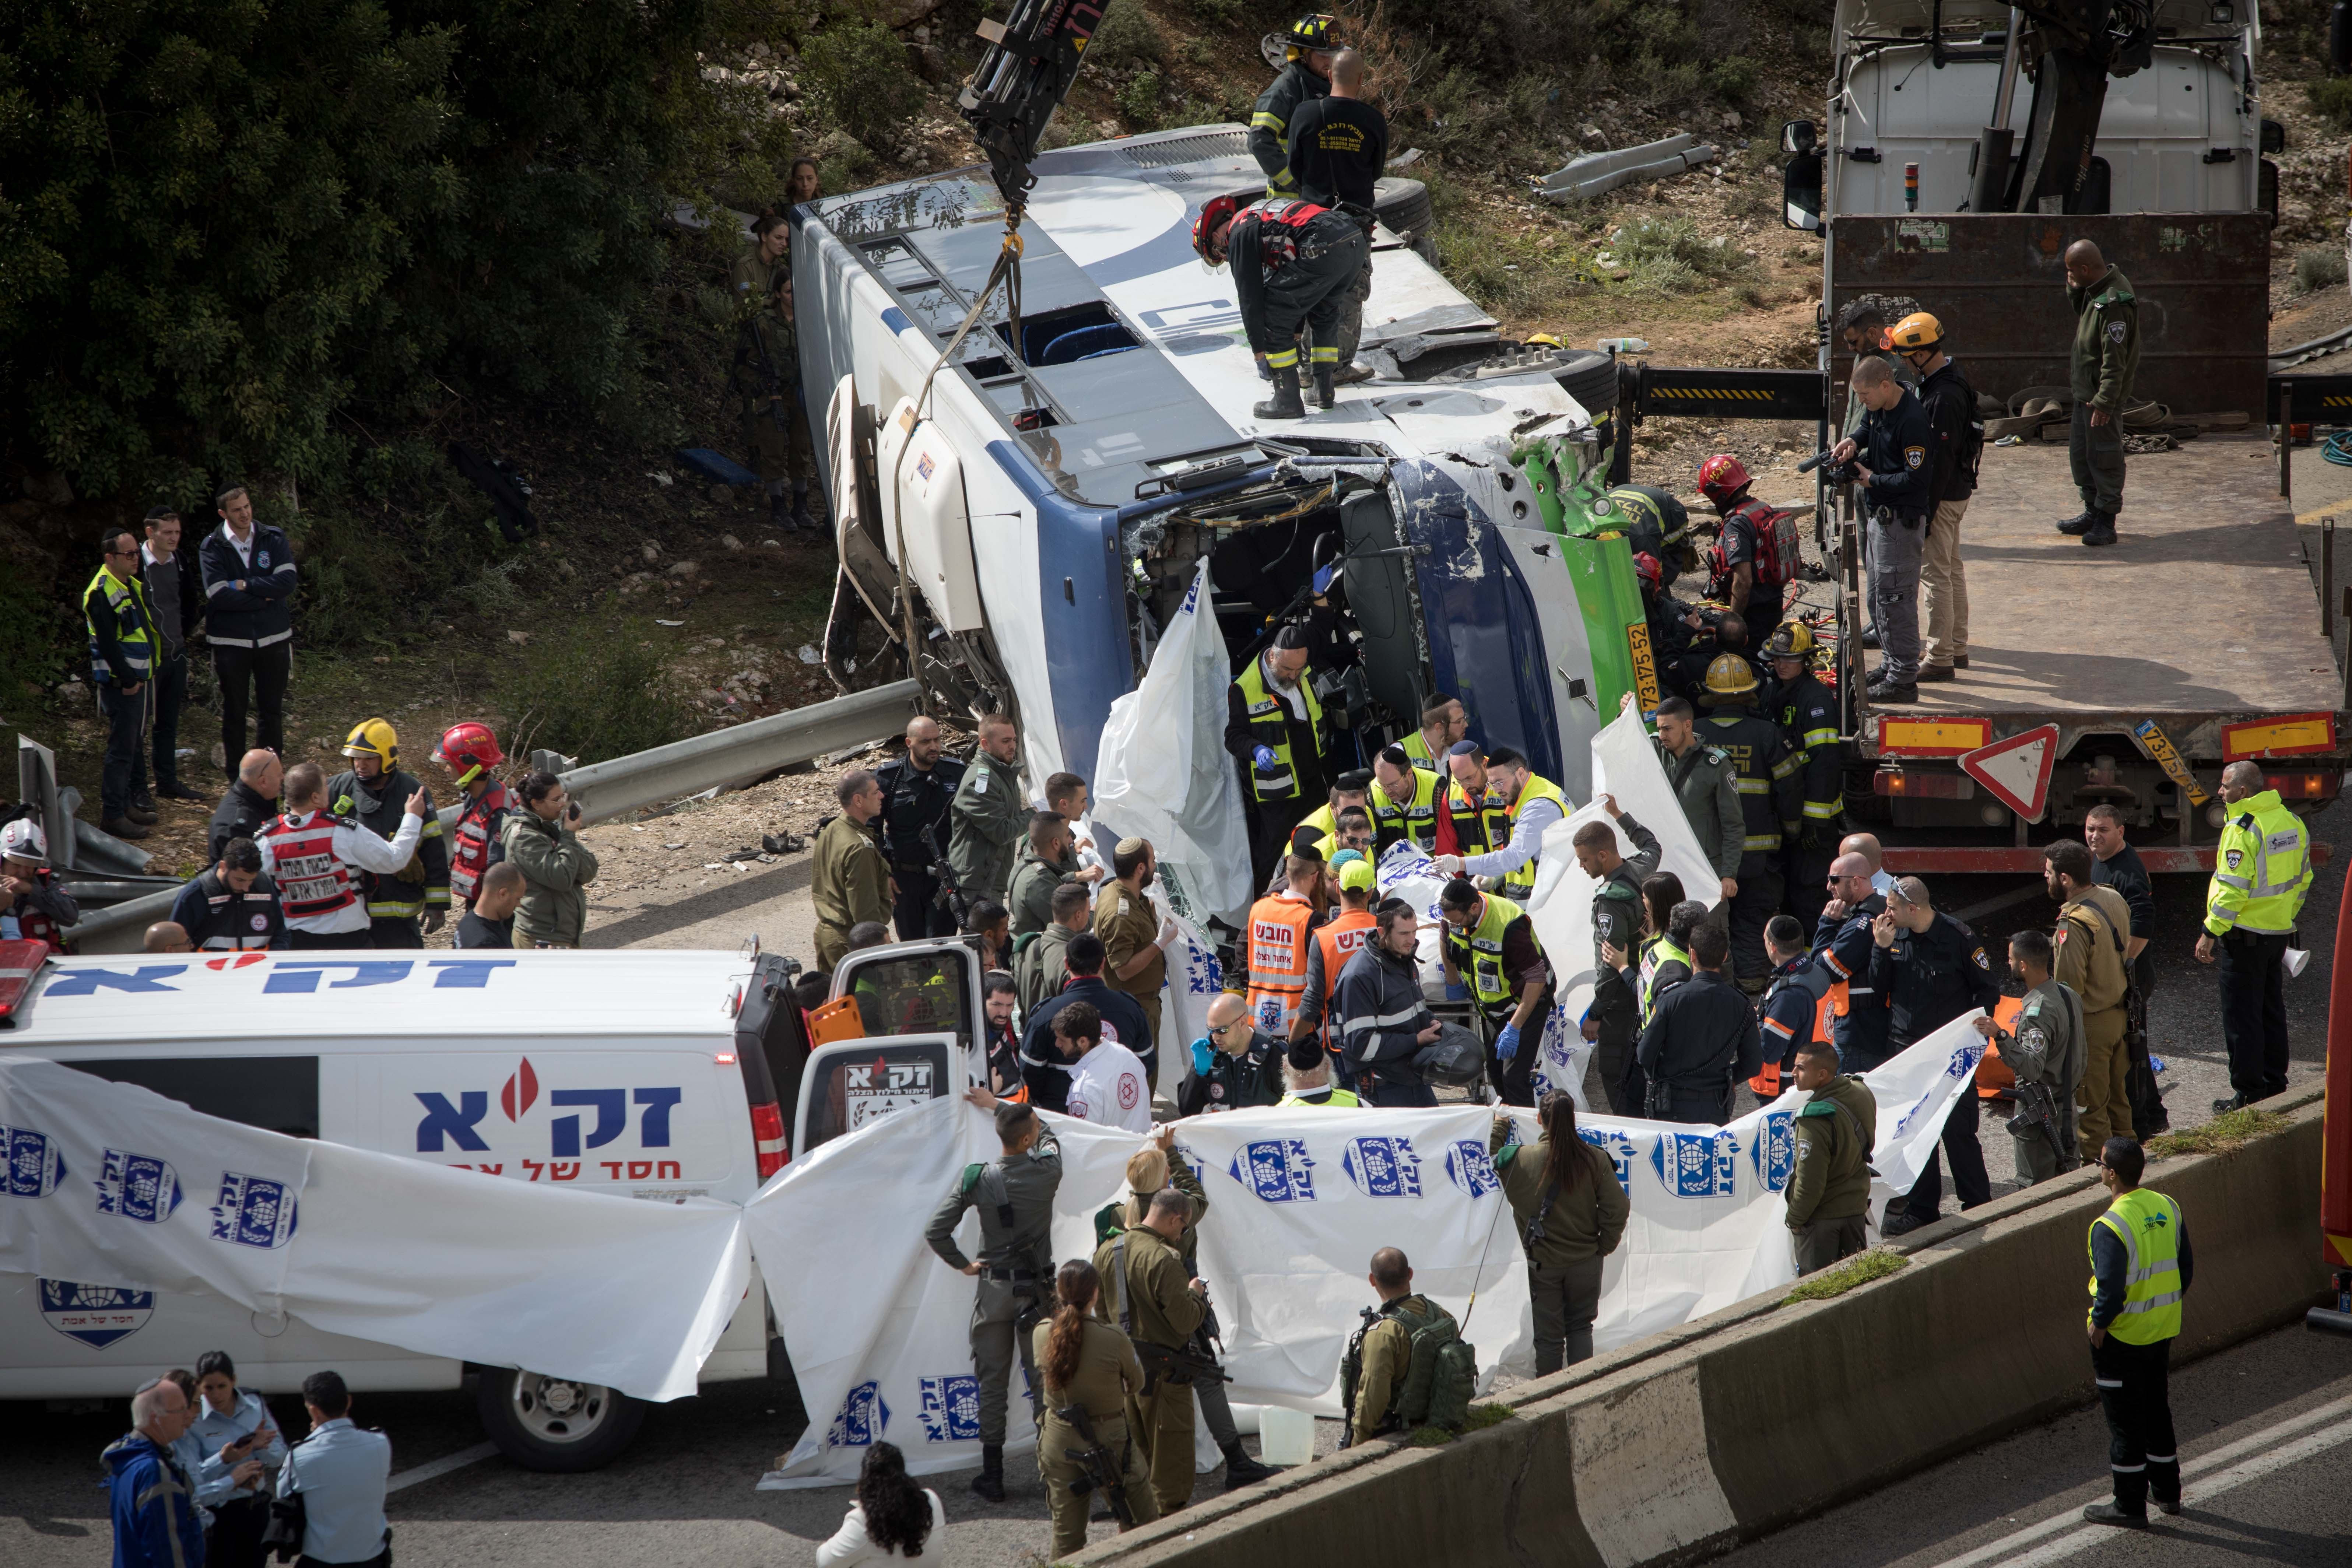 Jerusalem - 2 Killed, Dozens Injured When Public Bus Overturns On